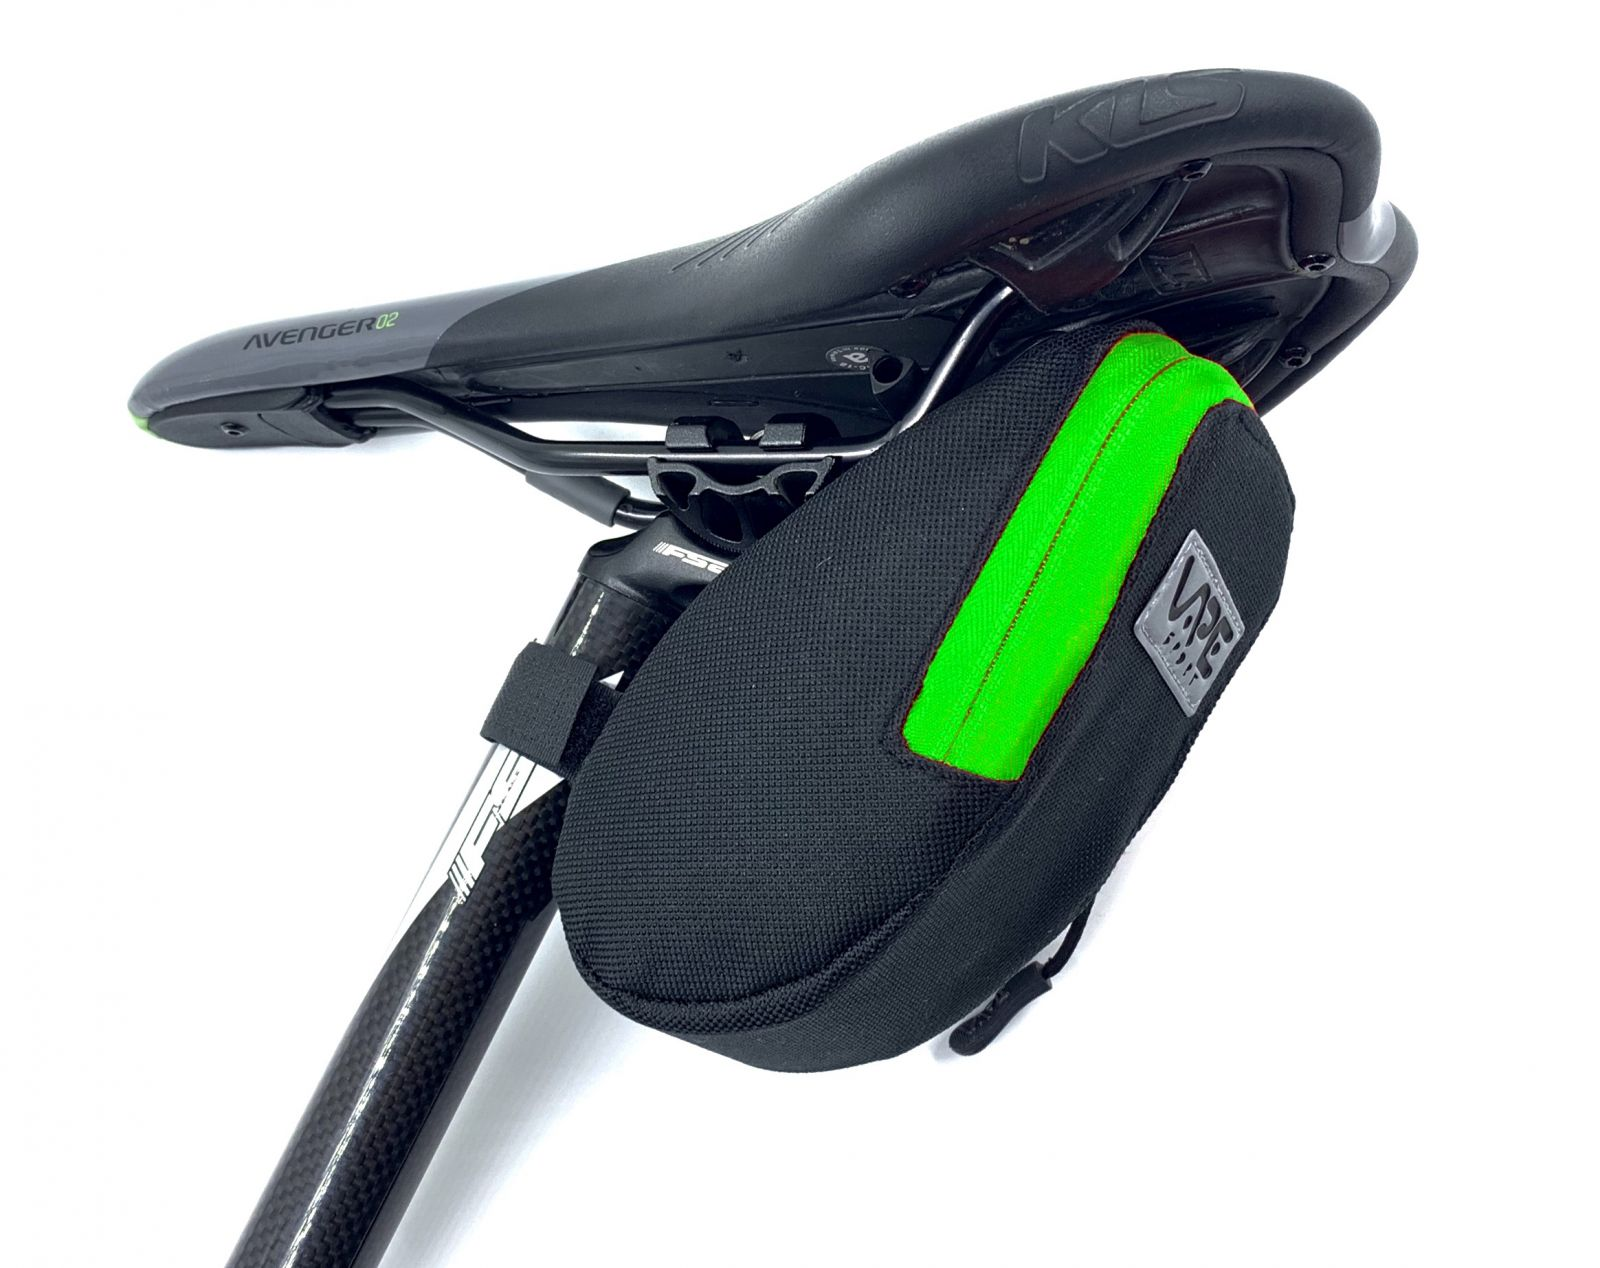 Brašna Vape M2 pod sedlo 17x8x7 cm reflex logo zelená